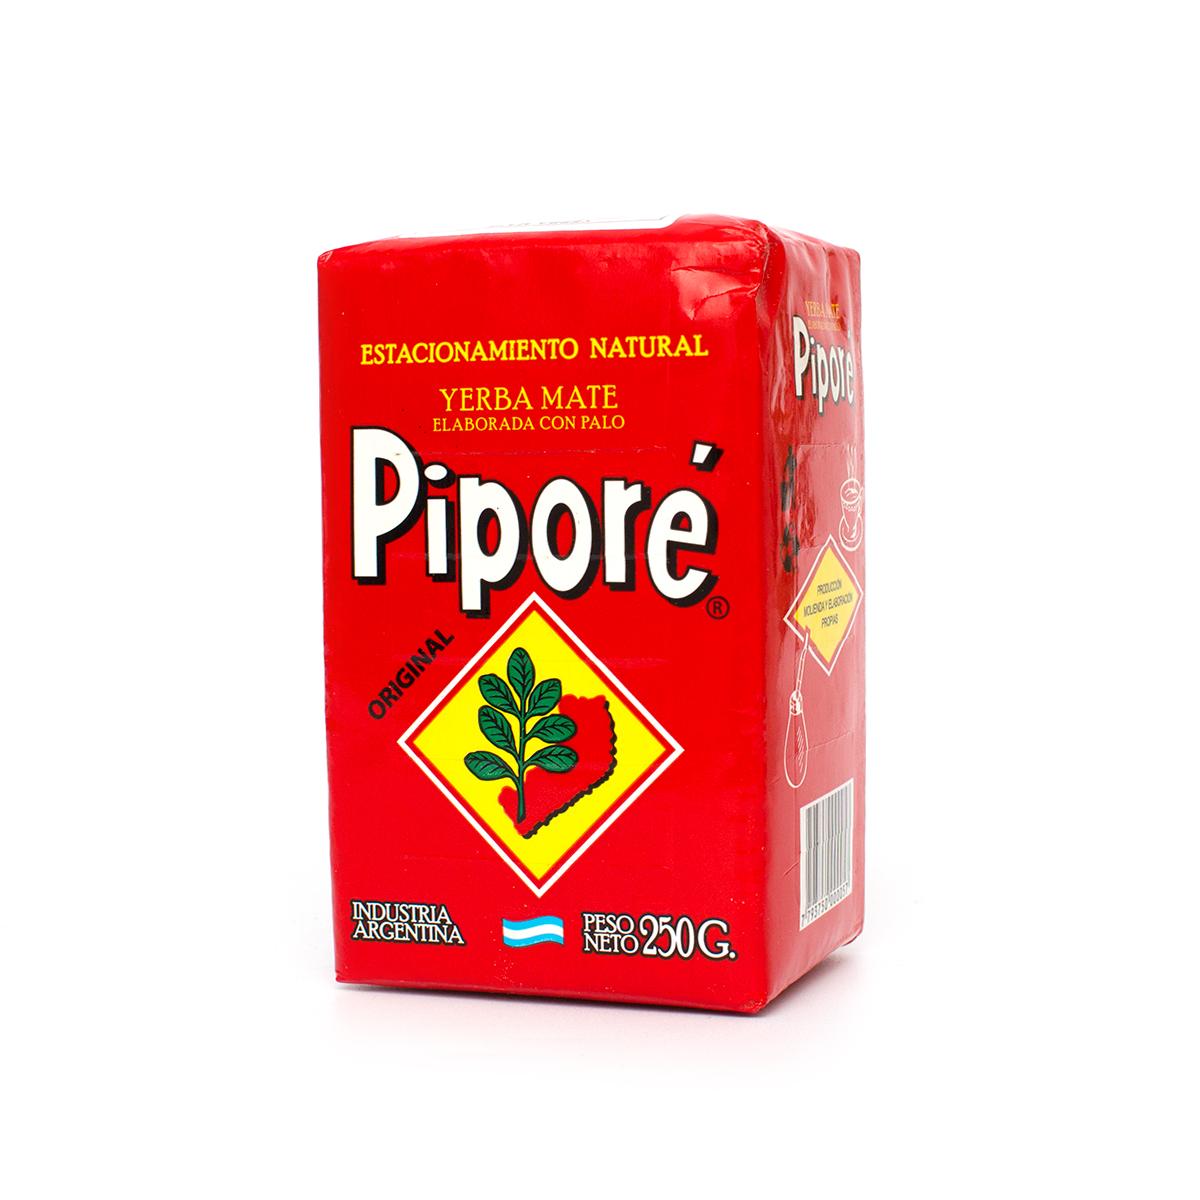 Мате Pipore tradicional, 250 г мате pipore especial 1000 г